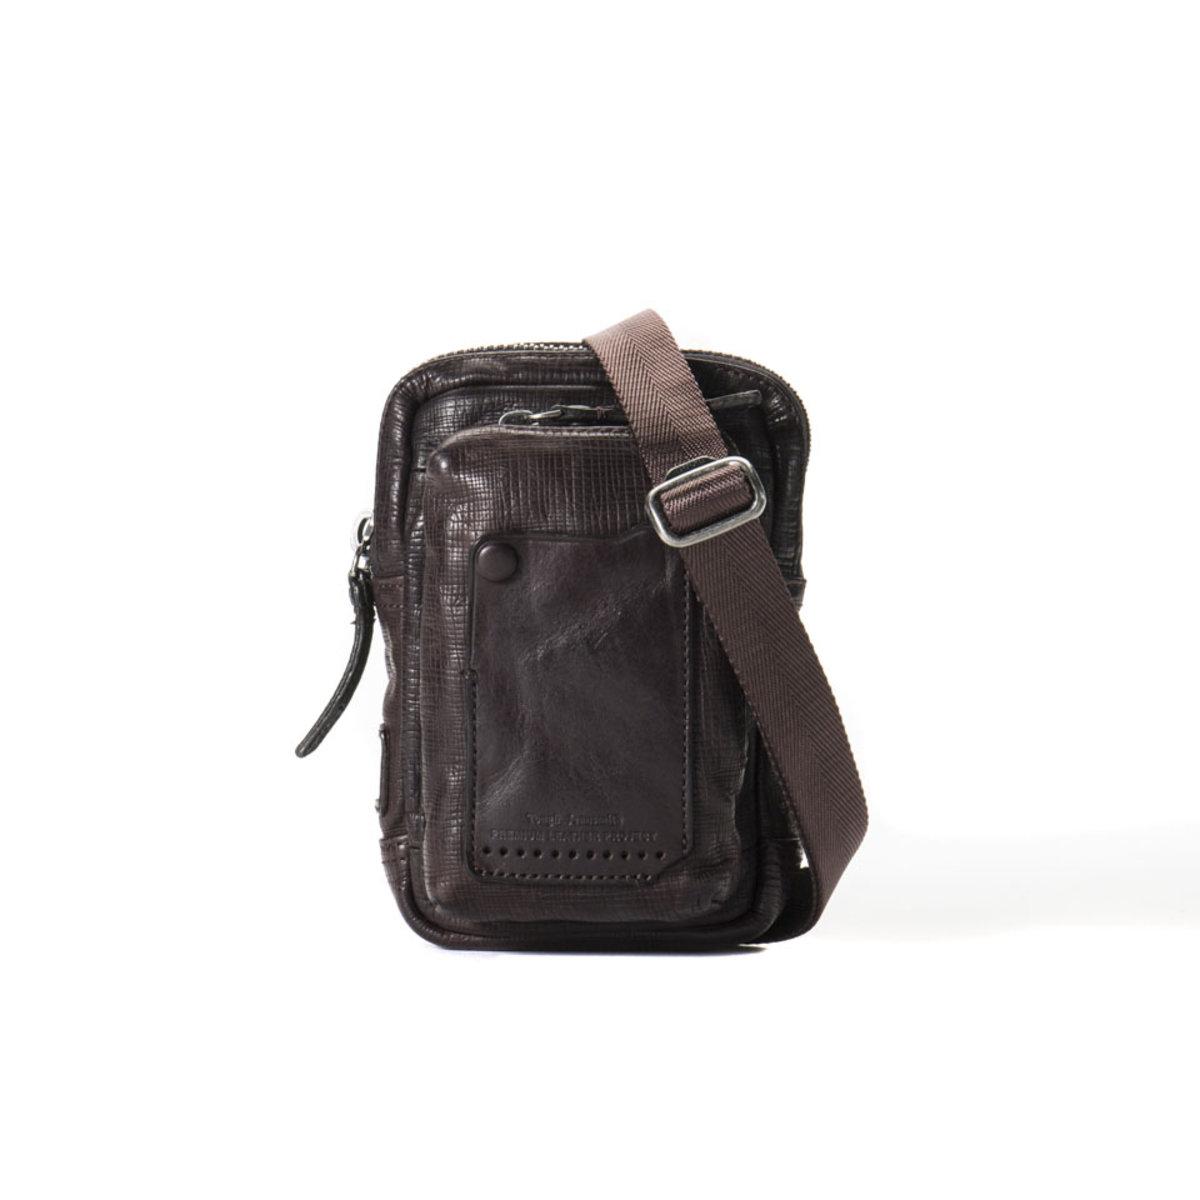 TOUGH Jeansmith   Leather Bag-Dark Brown   HKTVmall Online Shopping e86ca3889b